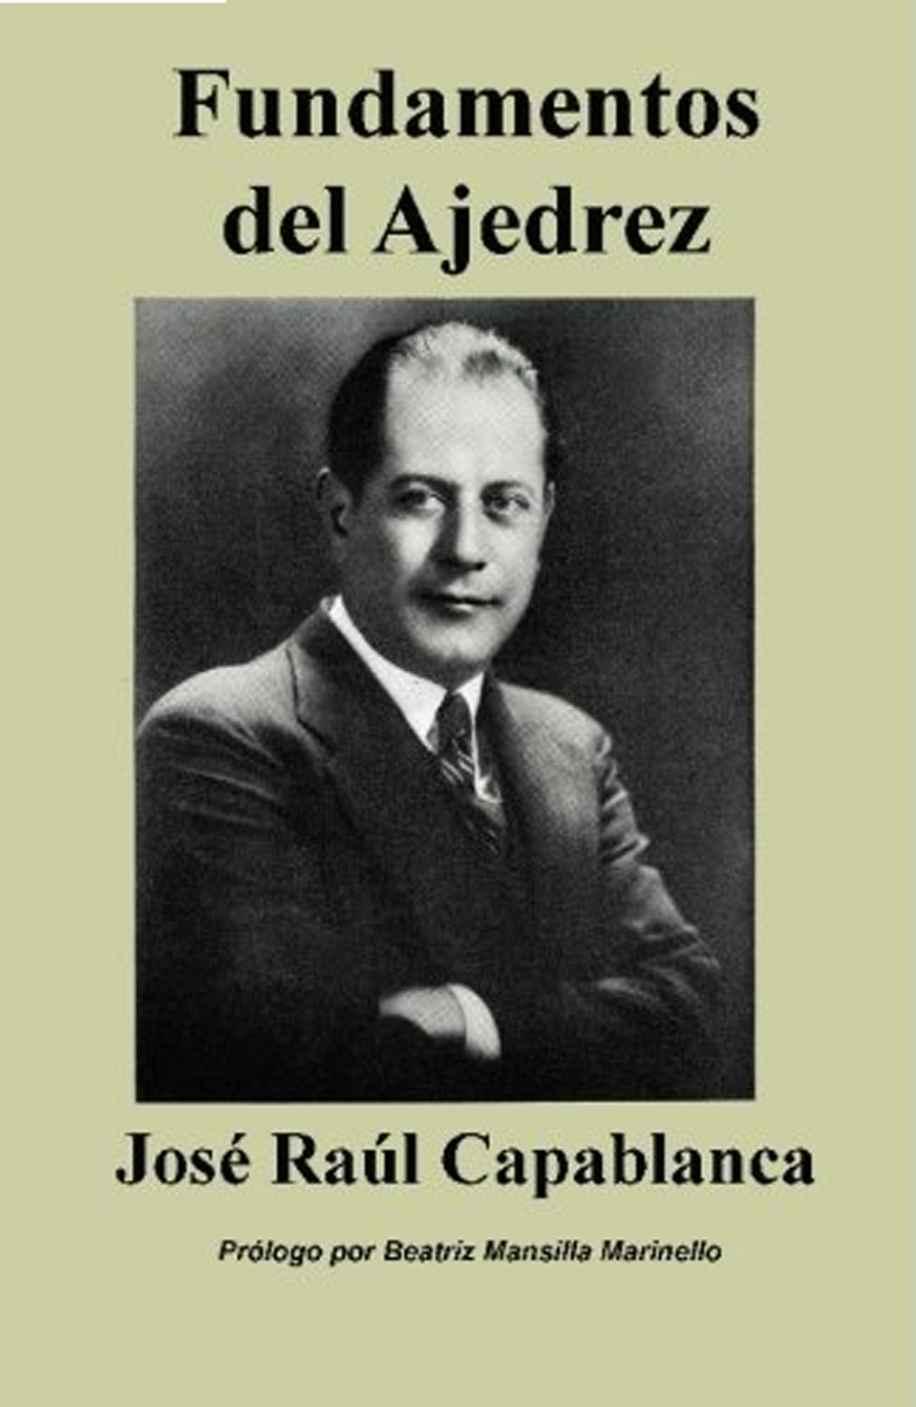 Jose Raul Capablanca Cover